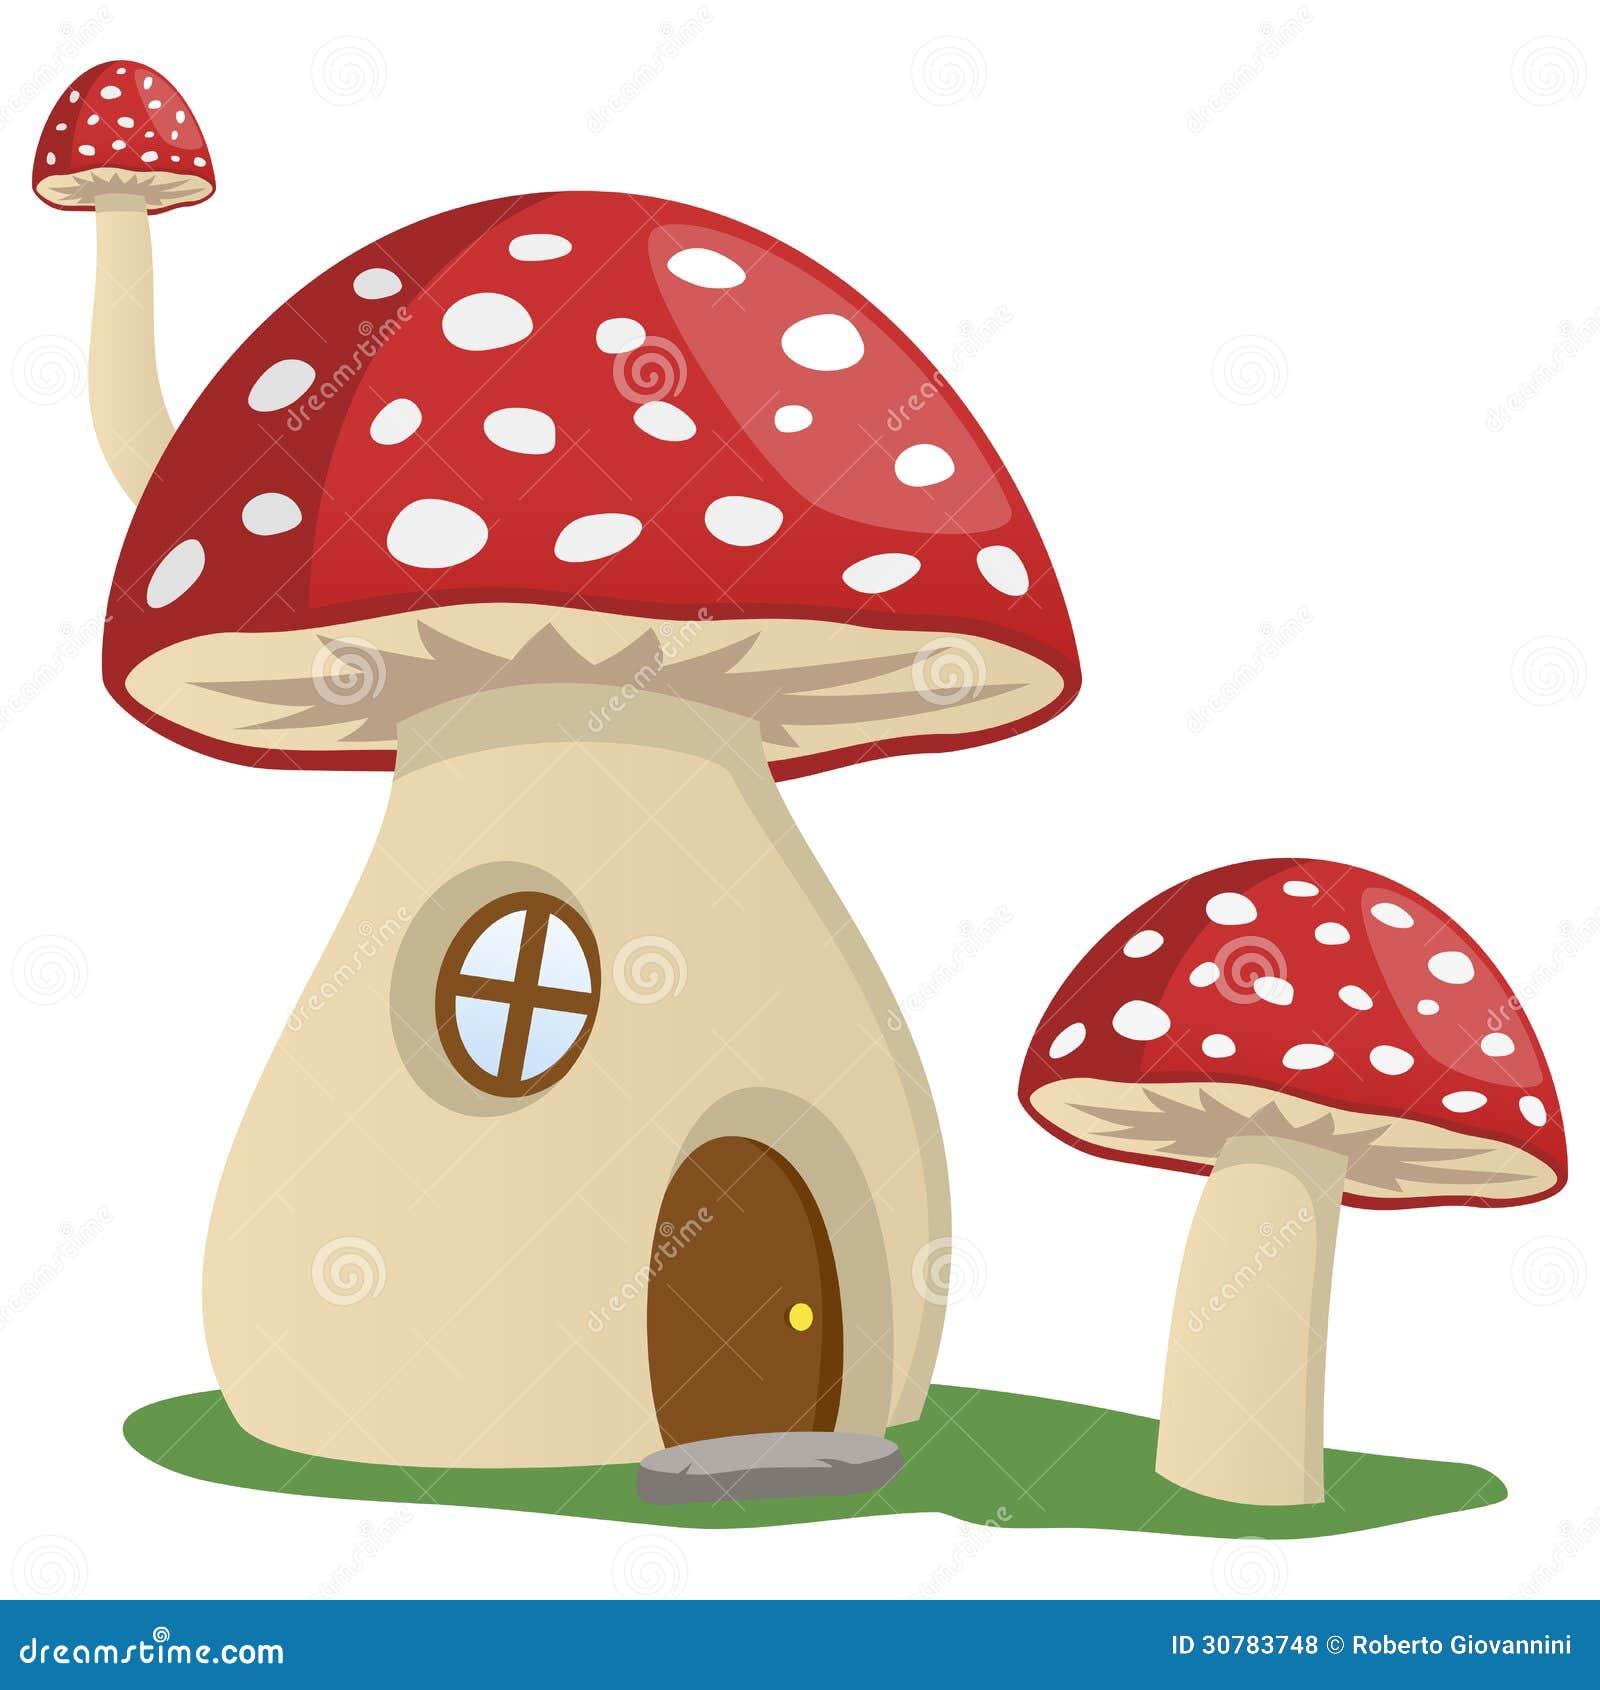 fairy tale mushroom house royalty free stock photos image 30783748